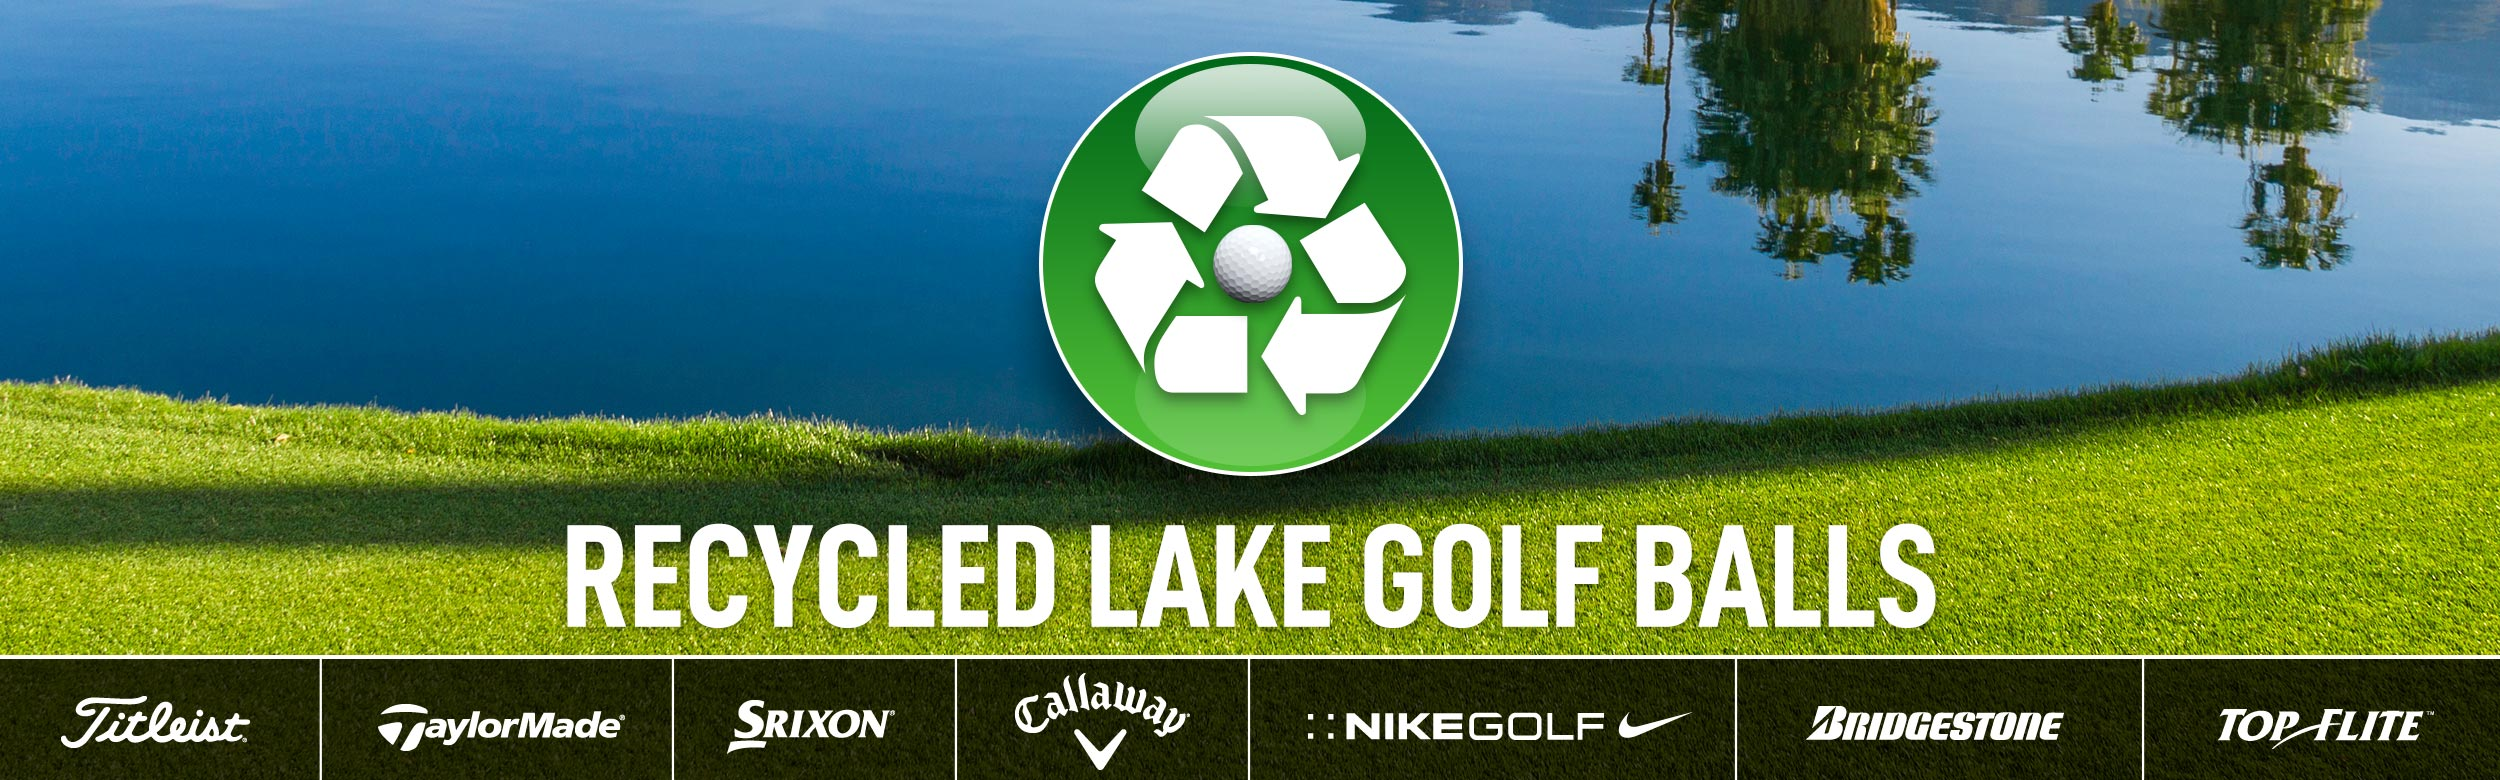 Recycled Lake Golf Balls